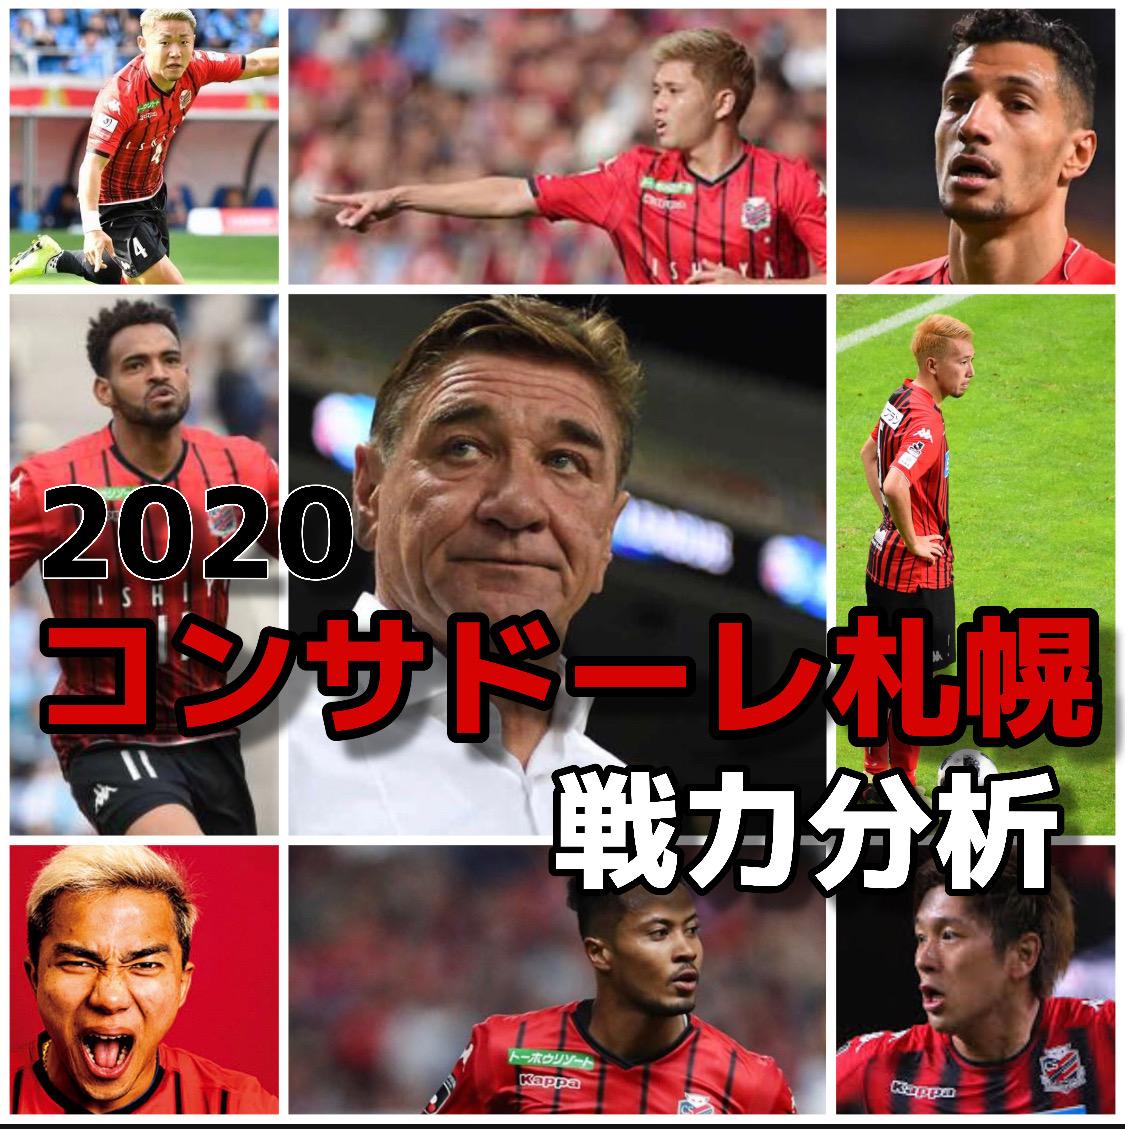 f:id:yamadaman0618:20200202211717j:plain